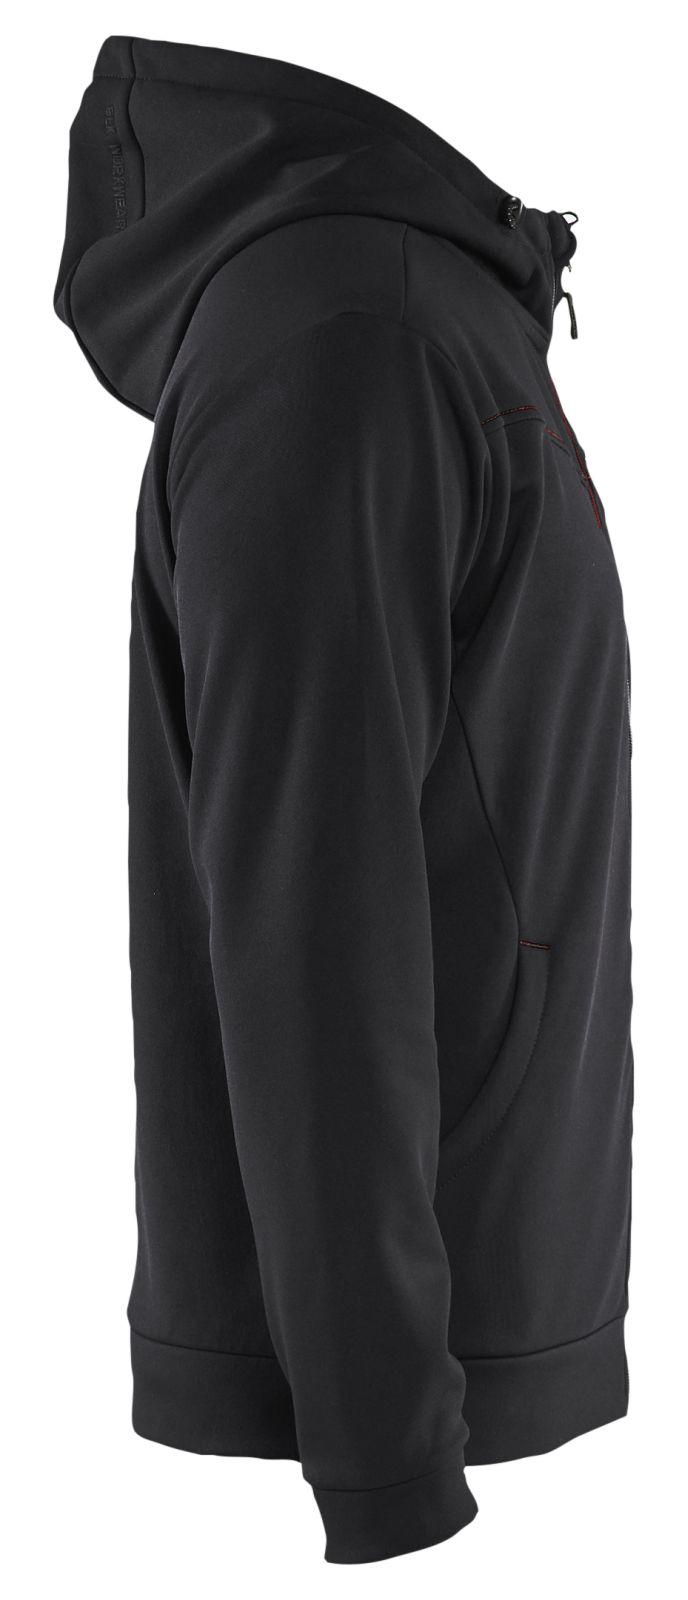 Blaklader Hooded sweatvesten 33632526 zwart-rood(9956)